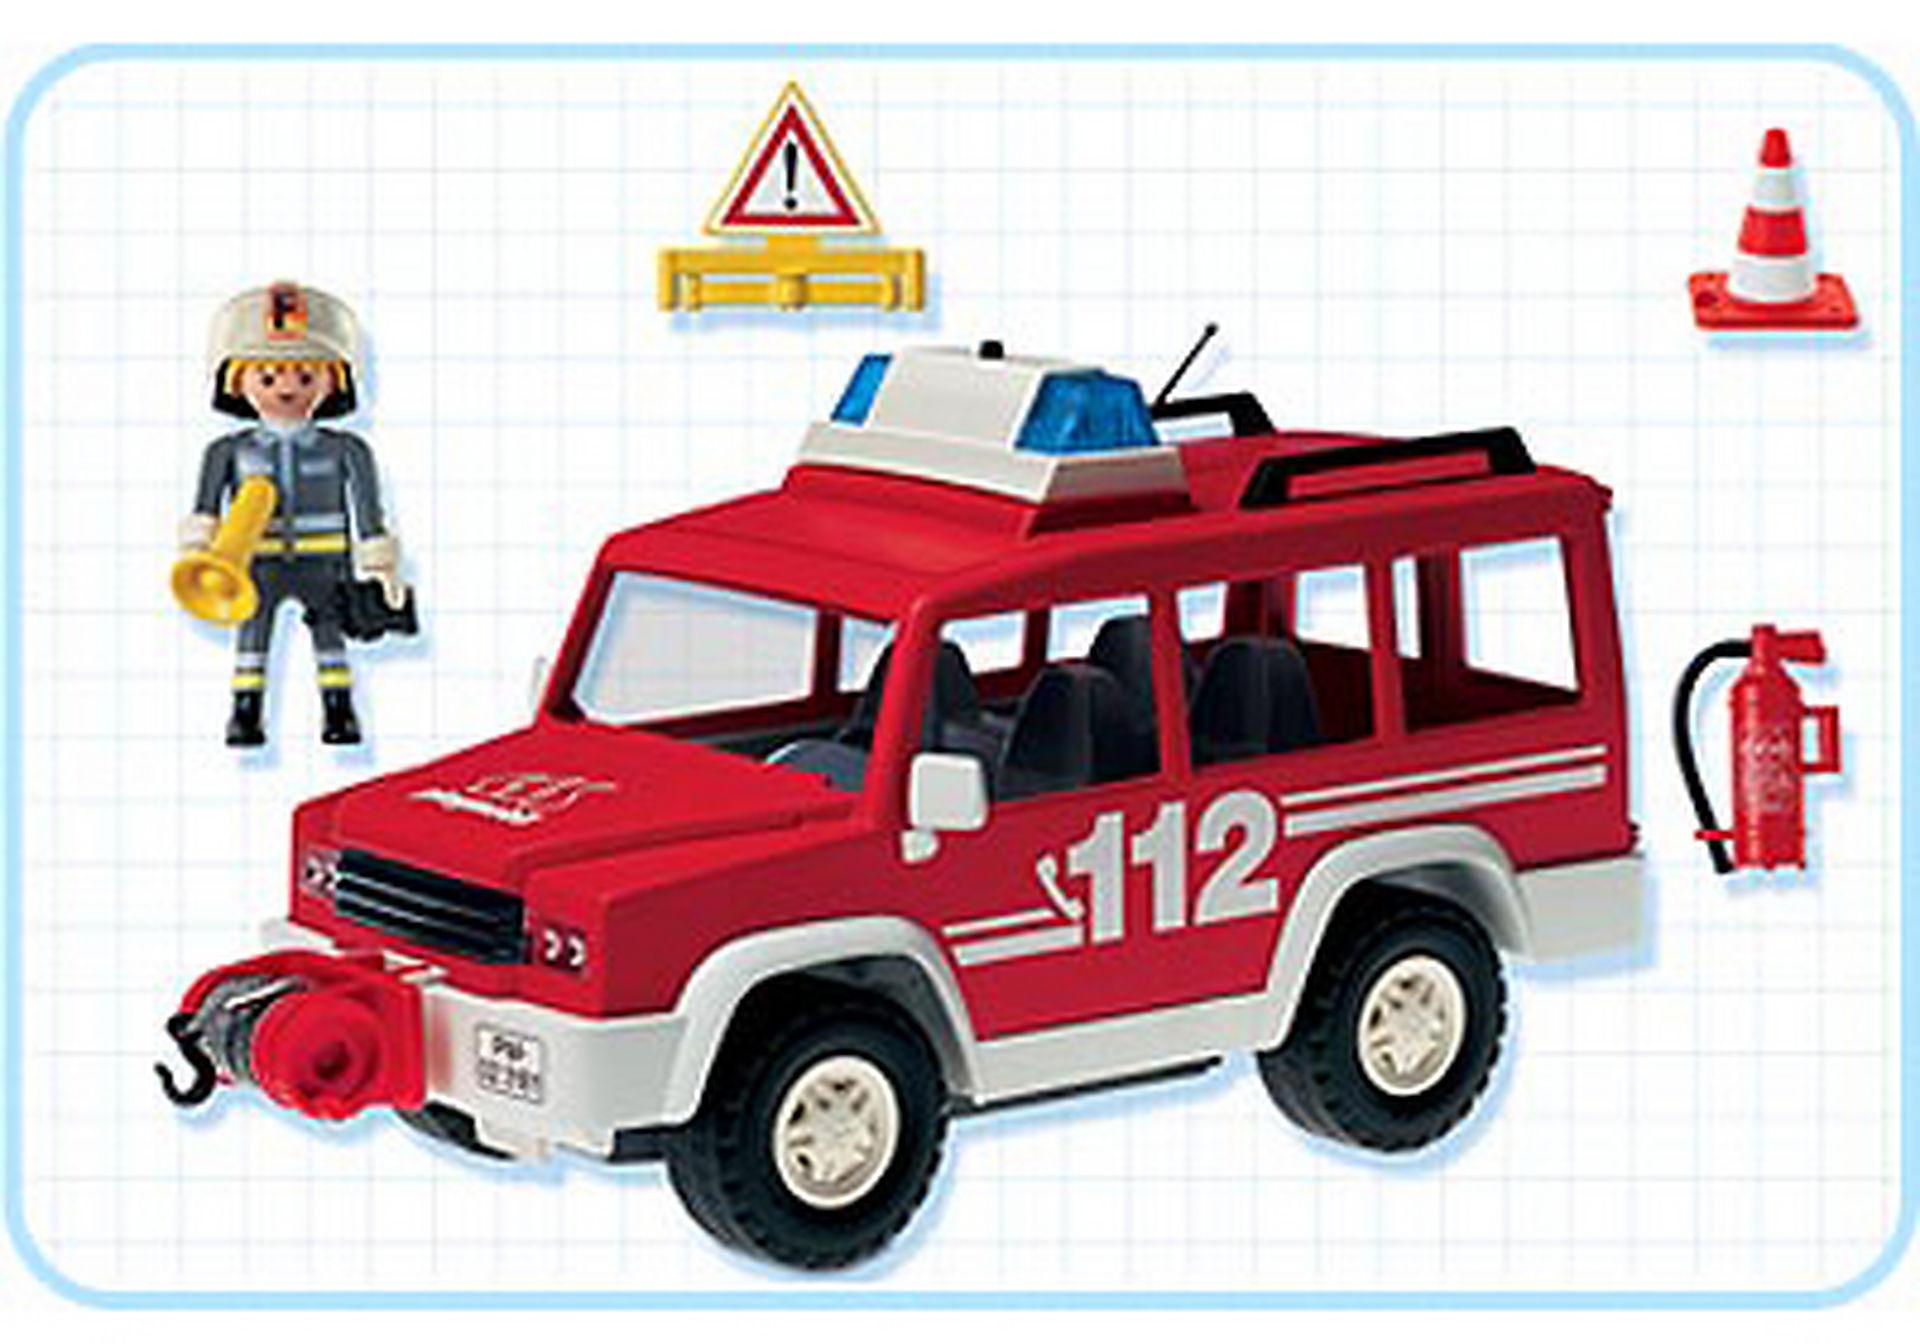 3181-A Feuerwehrvorausfahrzeug zoom image2